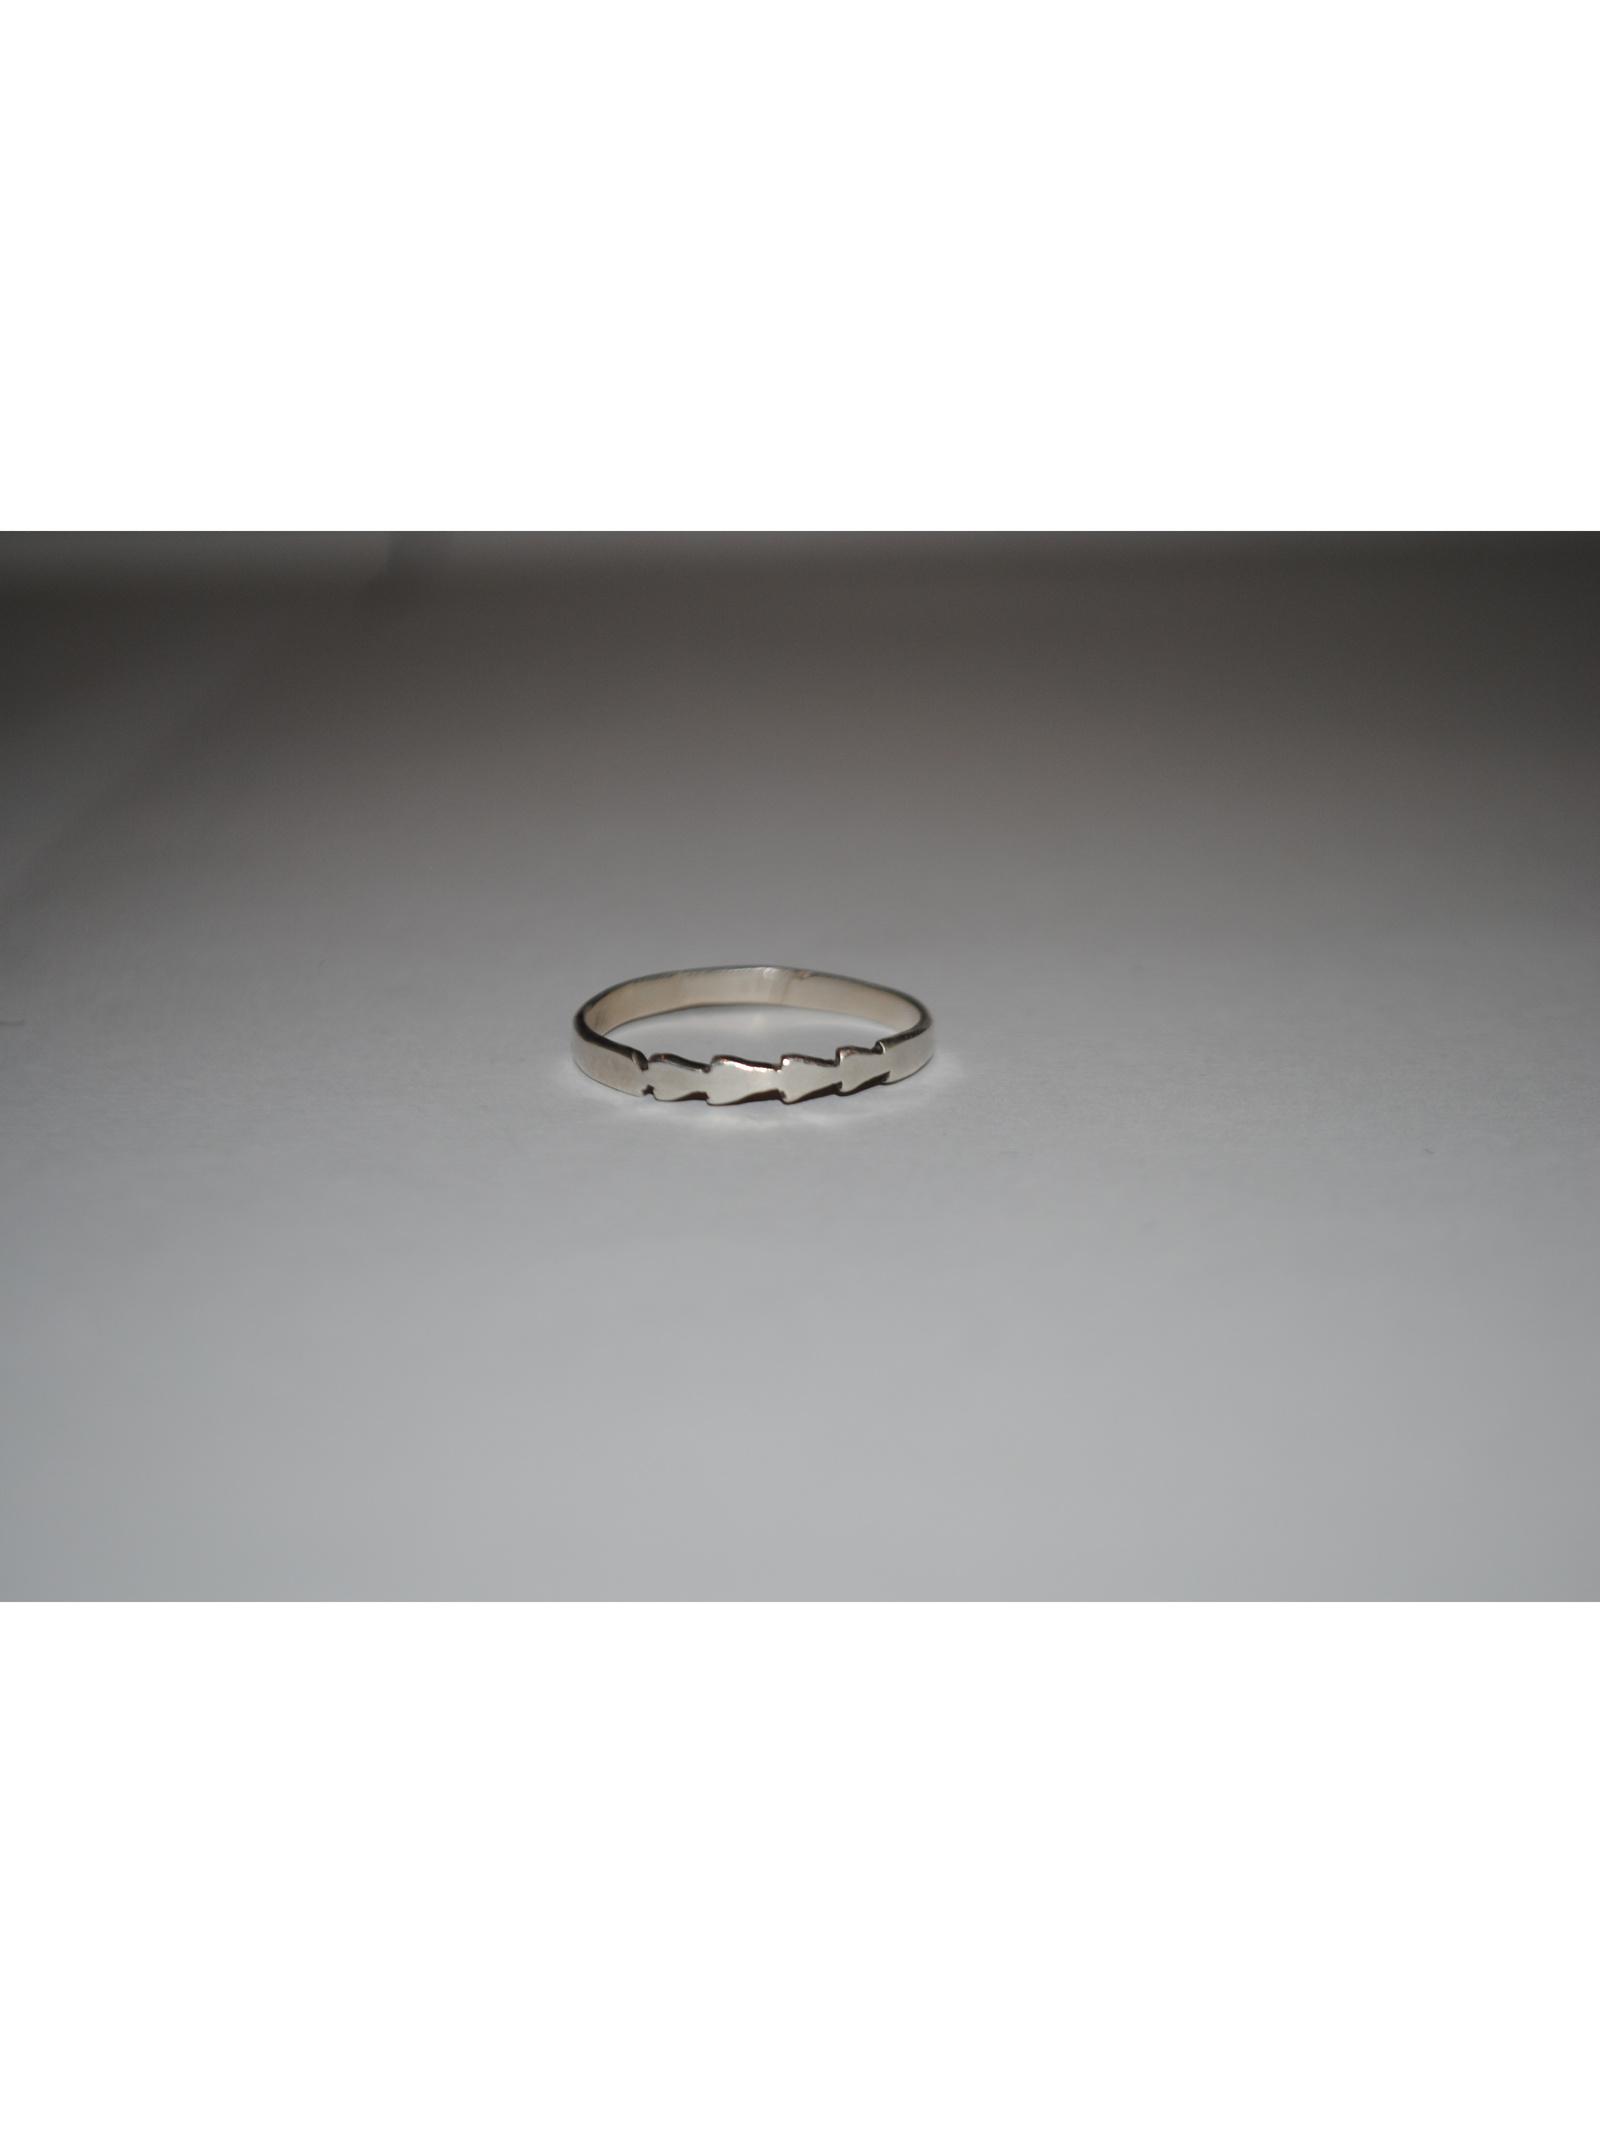 Kemi Designs The Tomahawk Ring